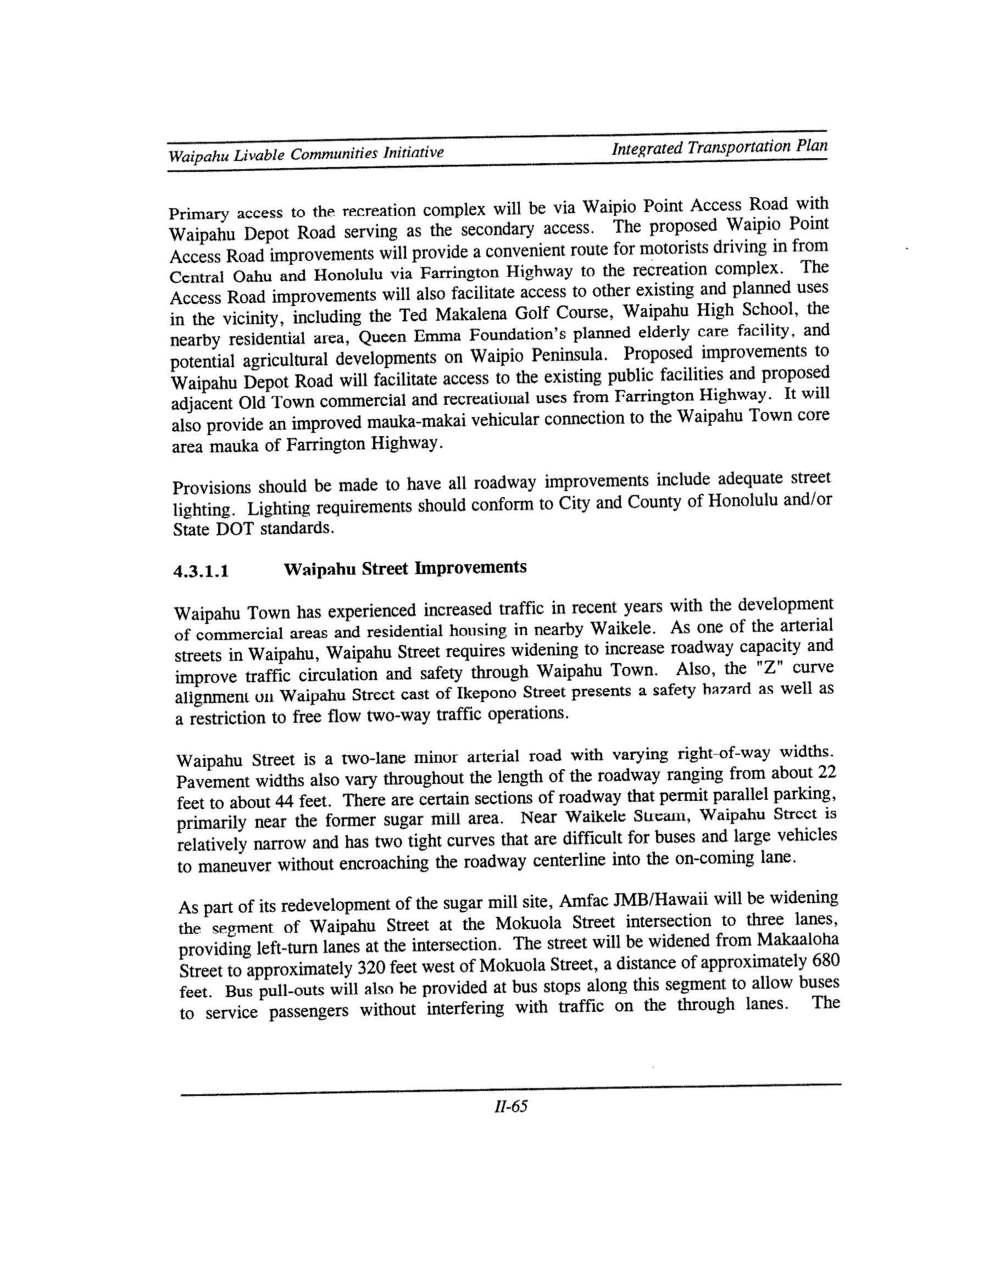 160531_WaipahuLivableCommunities(1998)_Page_080.jpg